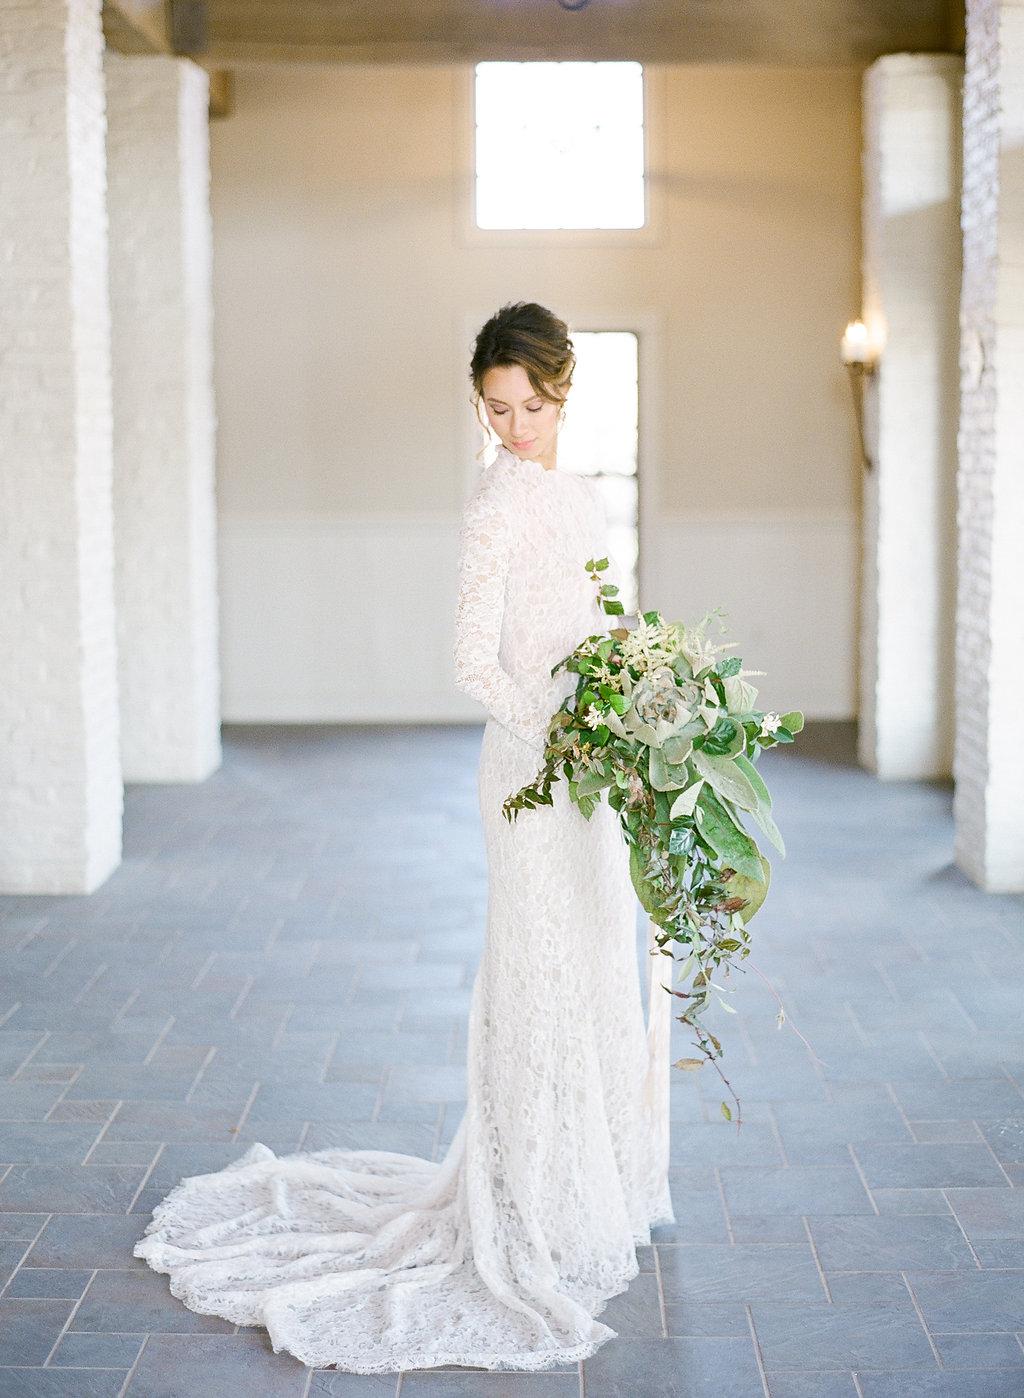 kristen_lynne_photography_early_mountain_vineyard_wedding-21